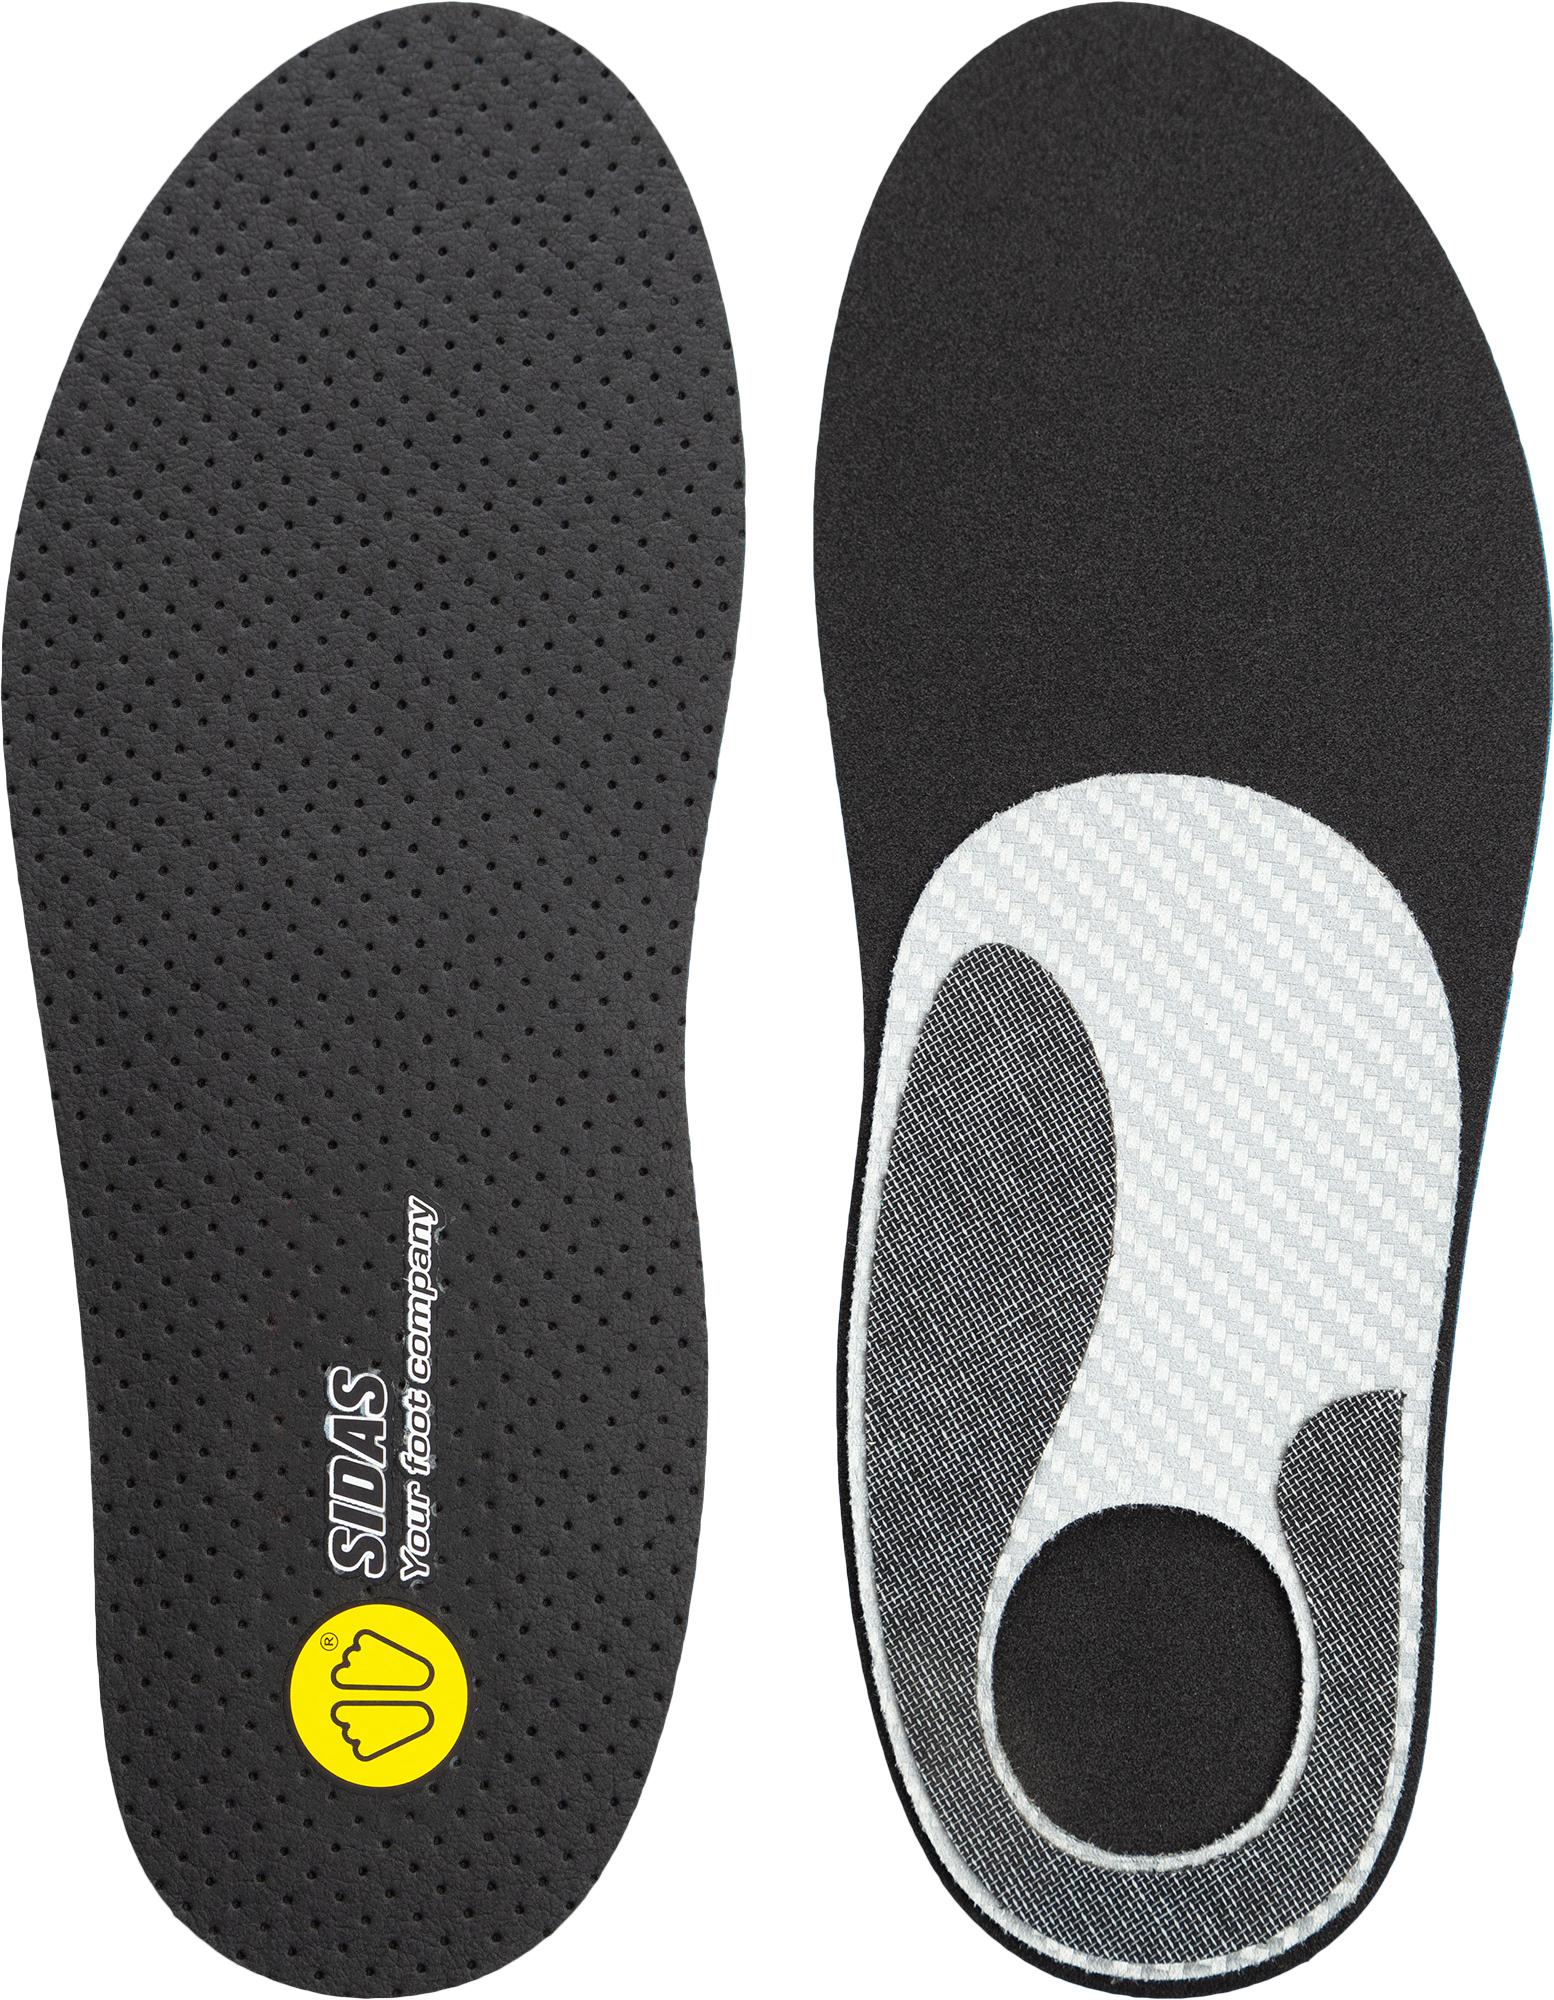 Sidas Стельки Insoles, размер 44-45